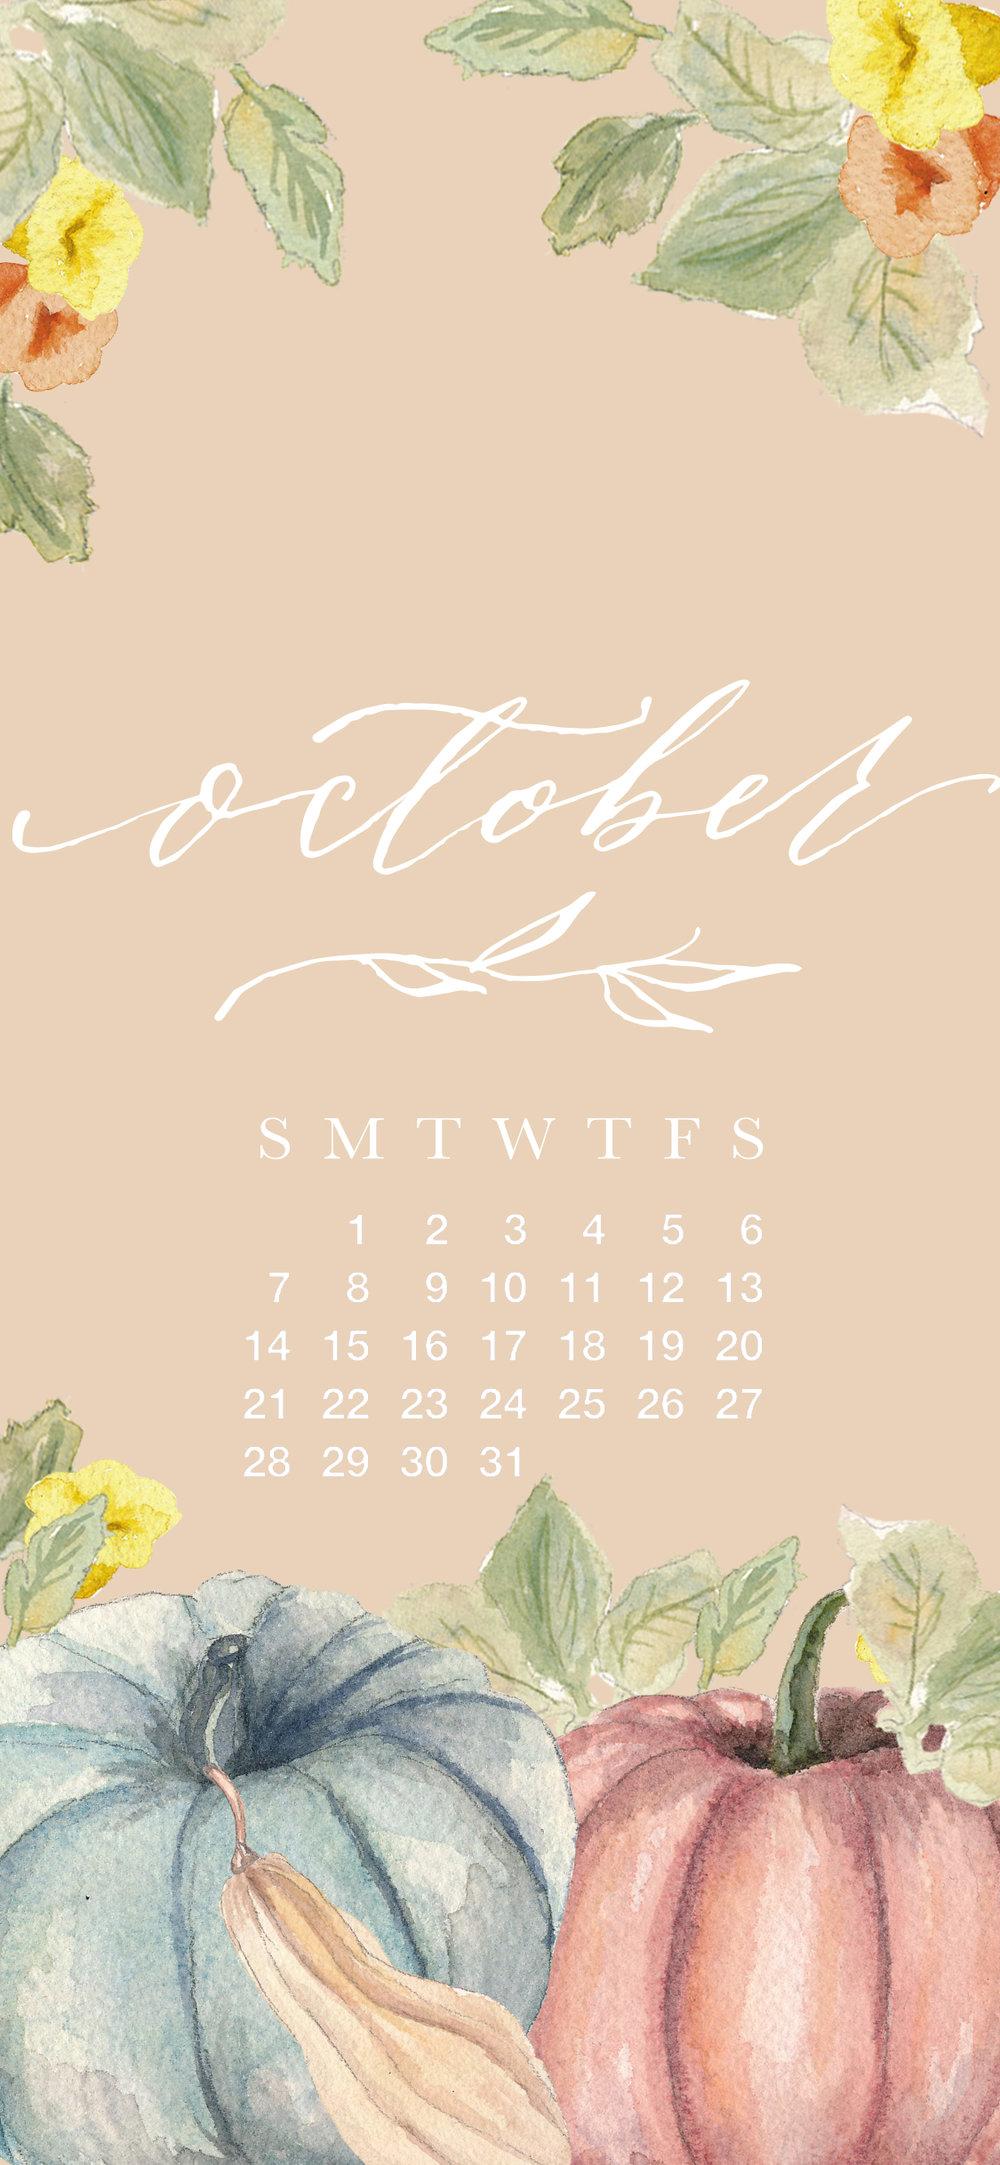 Free October 2018 Desktop and iPhone Calendar Download